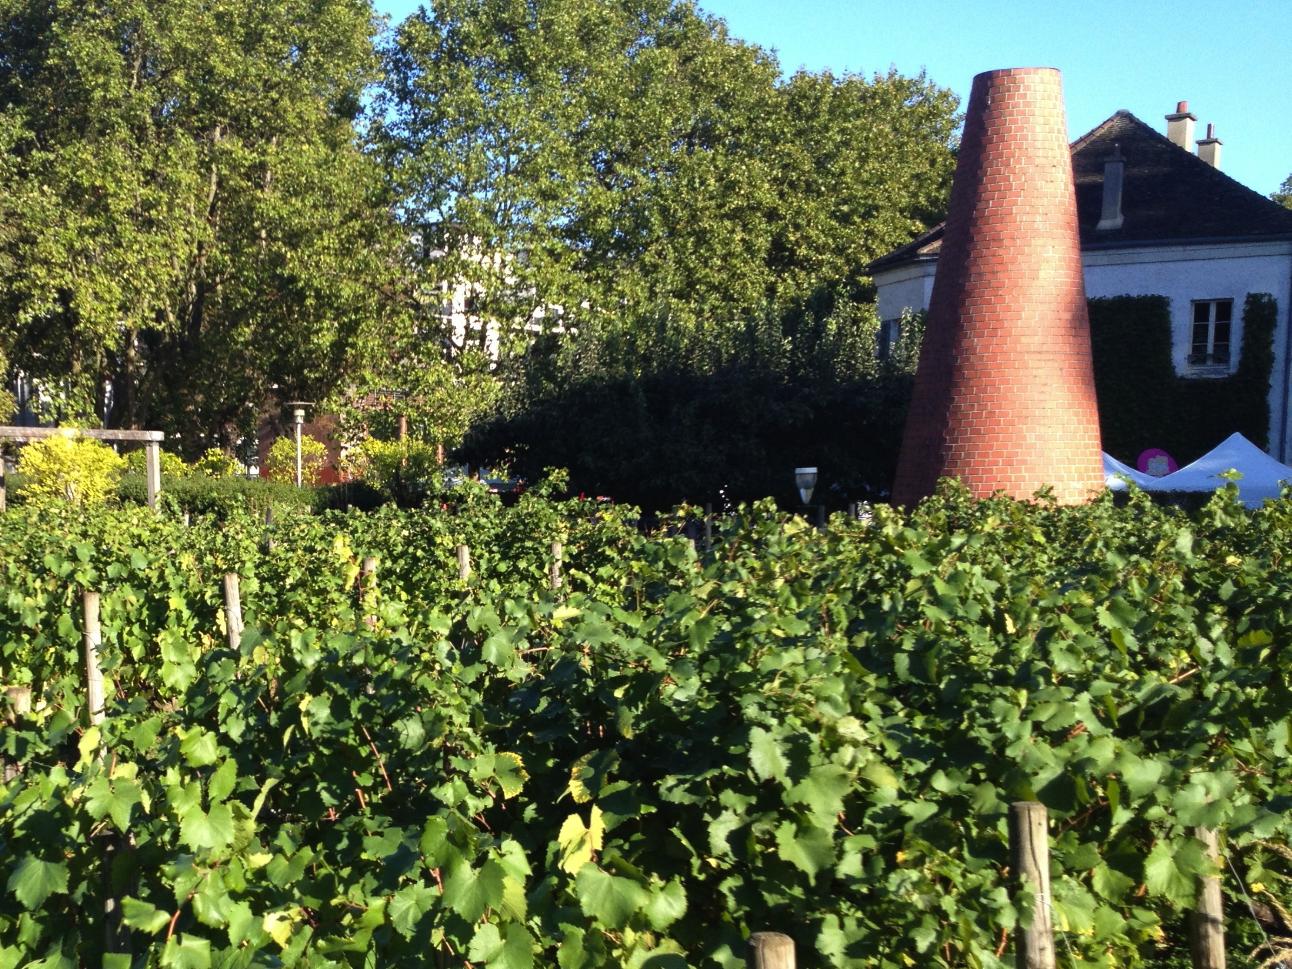 Bercy vineyard